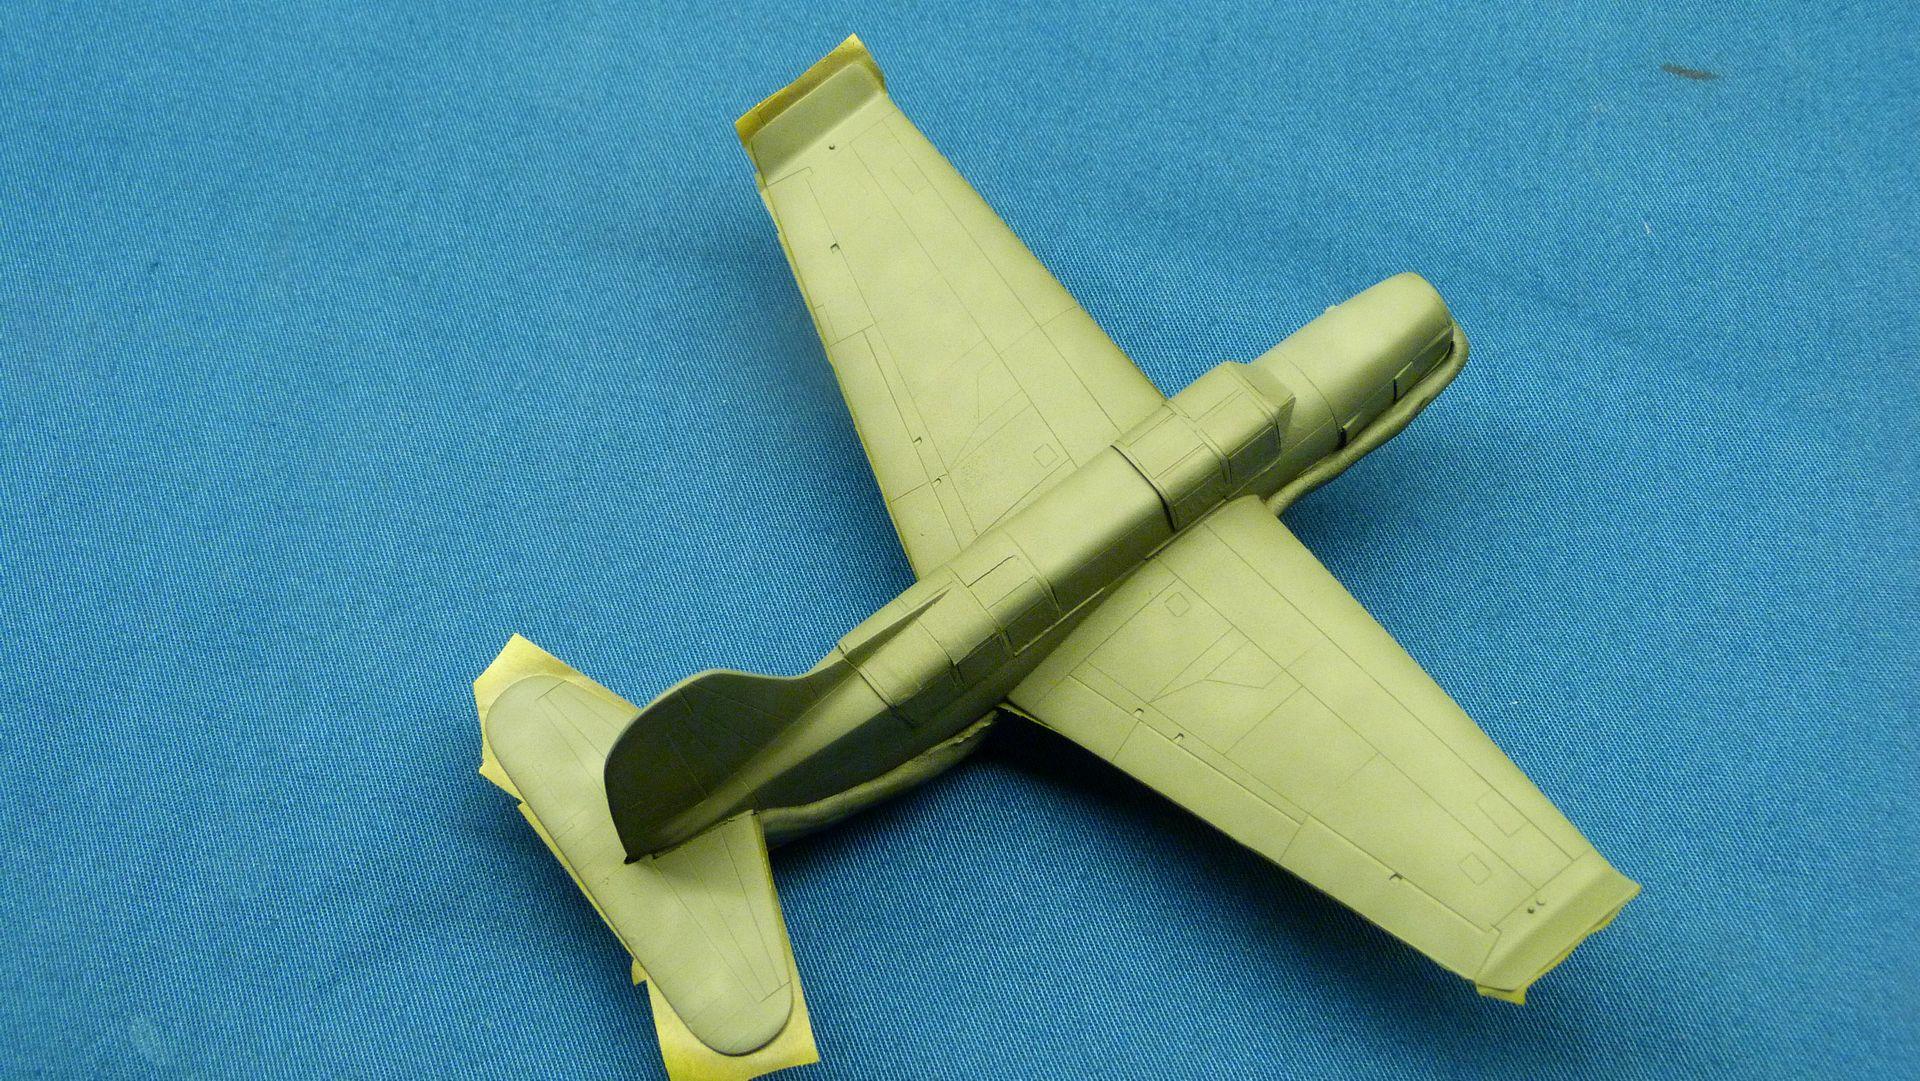 Julklappsbygge: Curtiss Seamew Mk1, Sword 1/72 - Sida 3 47327182702_0c5814c5e4_o